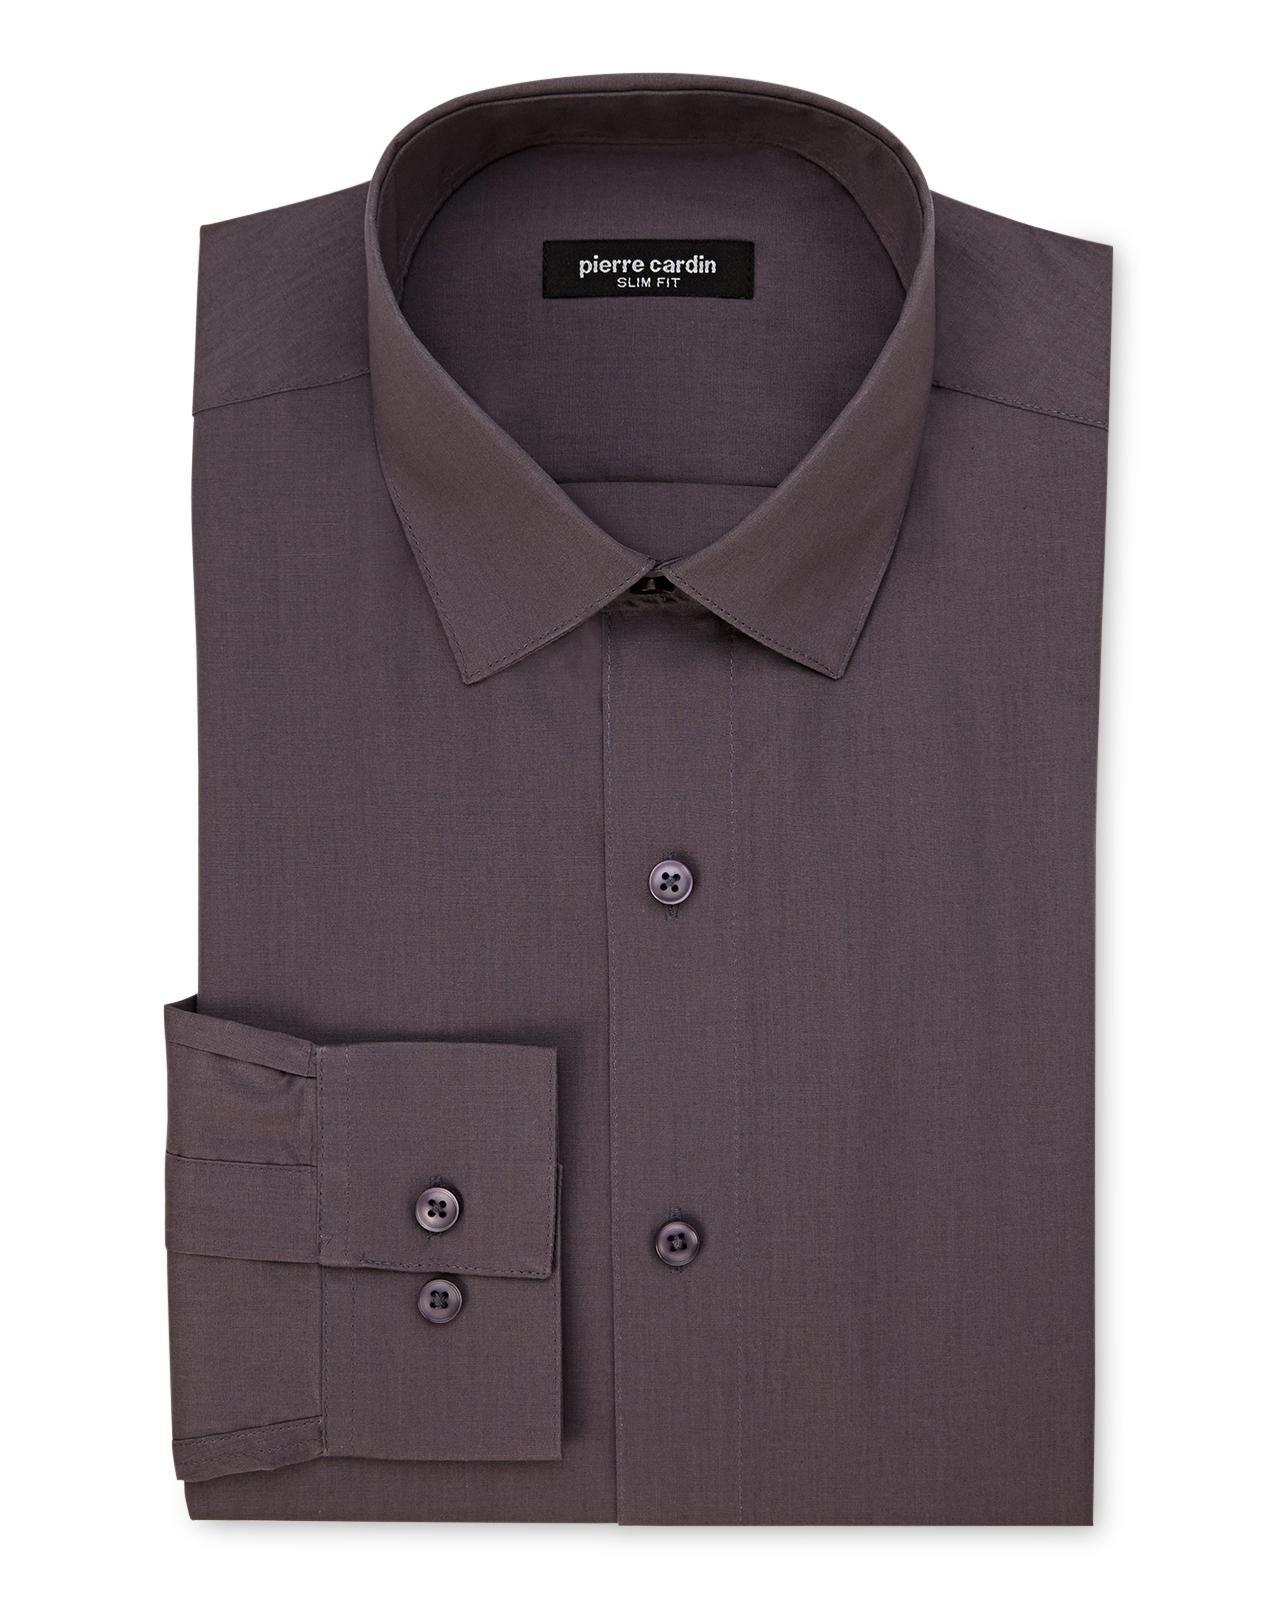 Slim Fit Charcoal Dress Shirt Pinterest Charcoal Dress Pierre